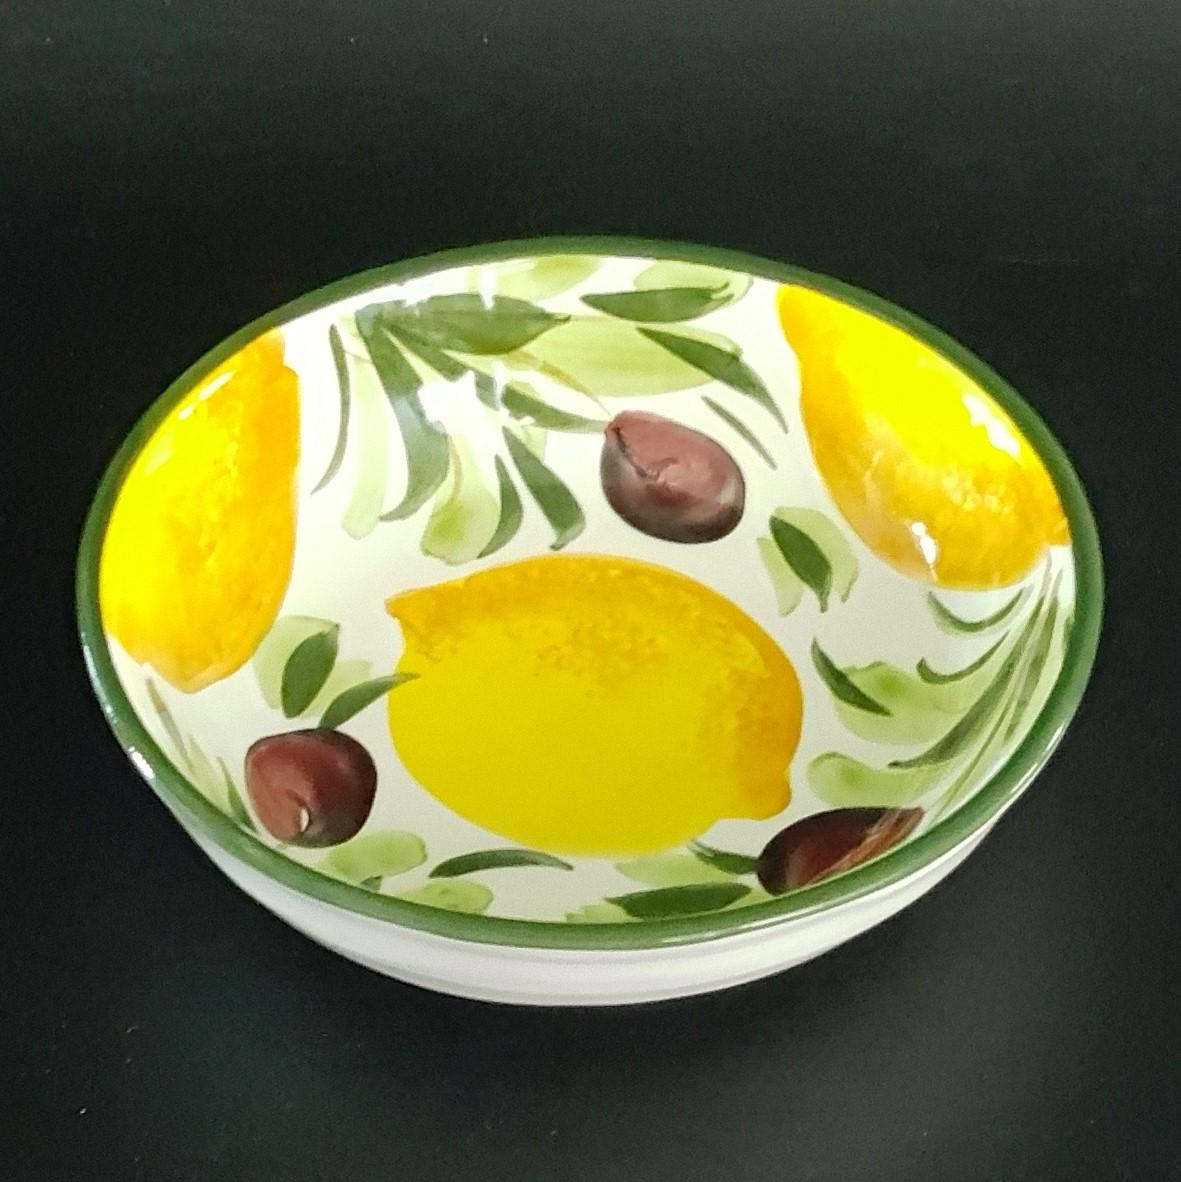 citroen 12cm 8.50